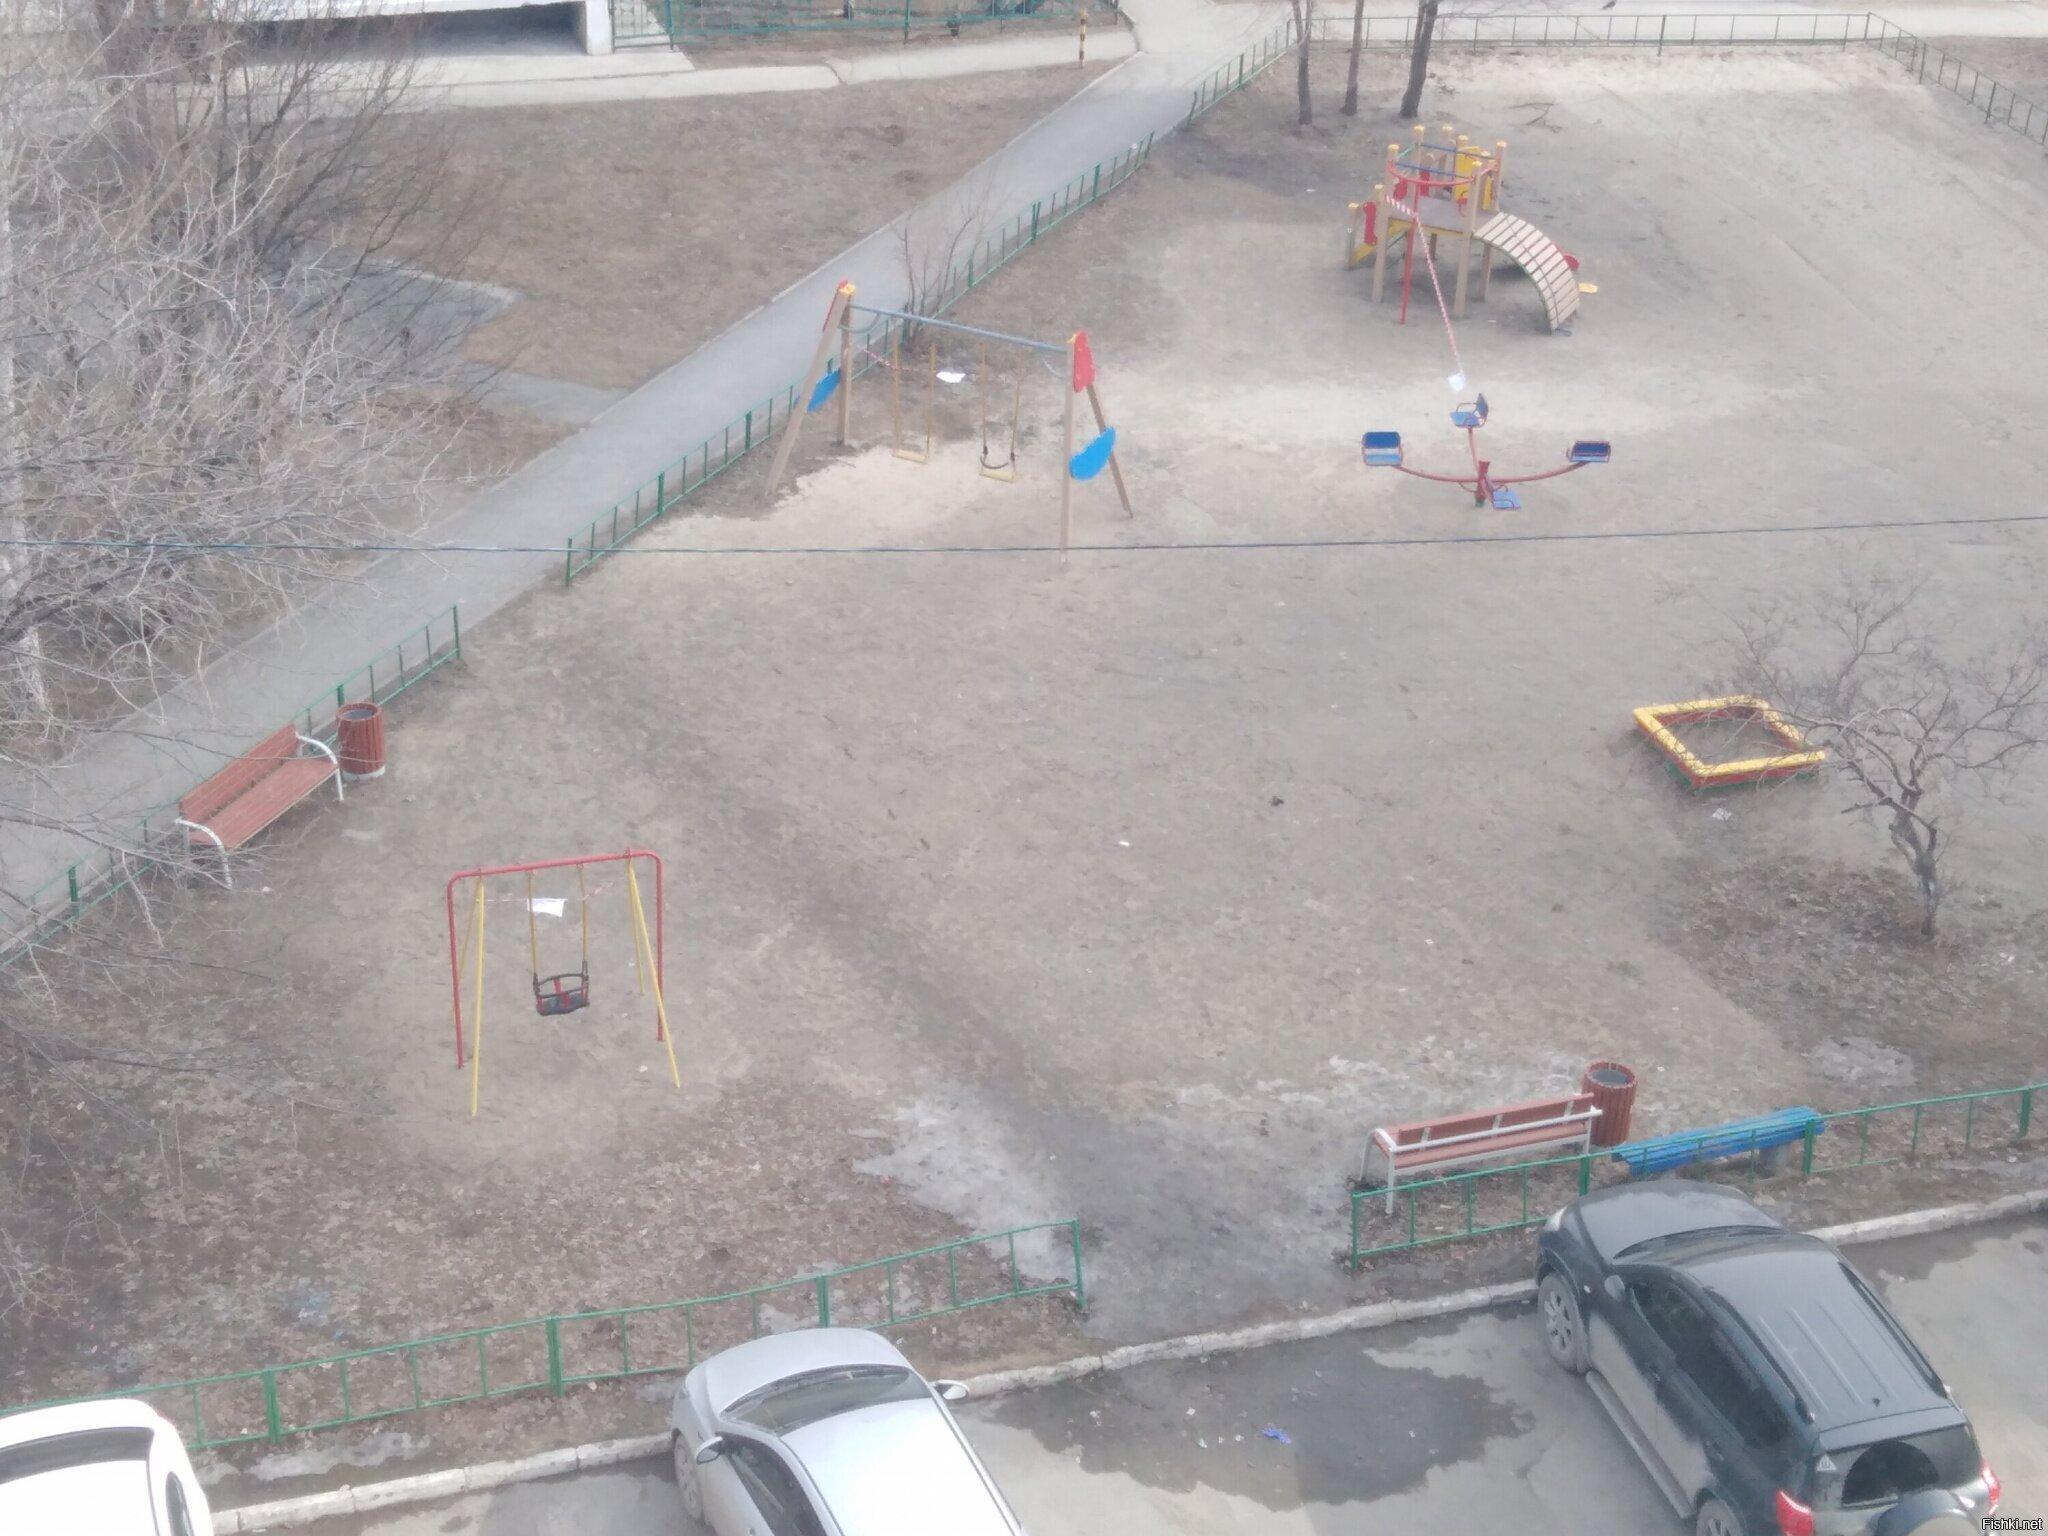 А у нас детскую площадку закрыли